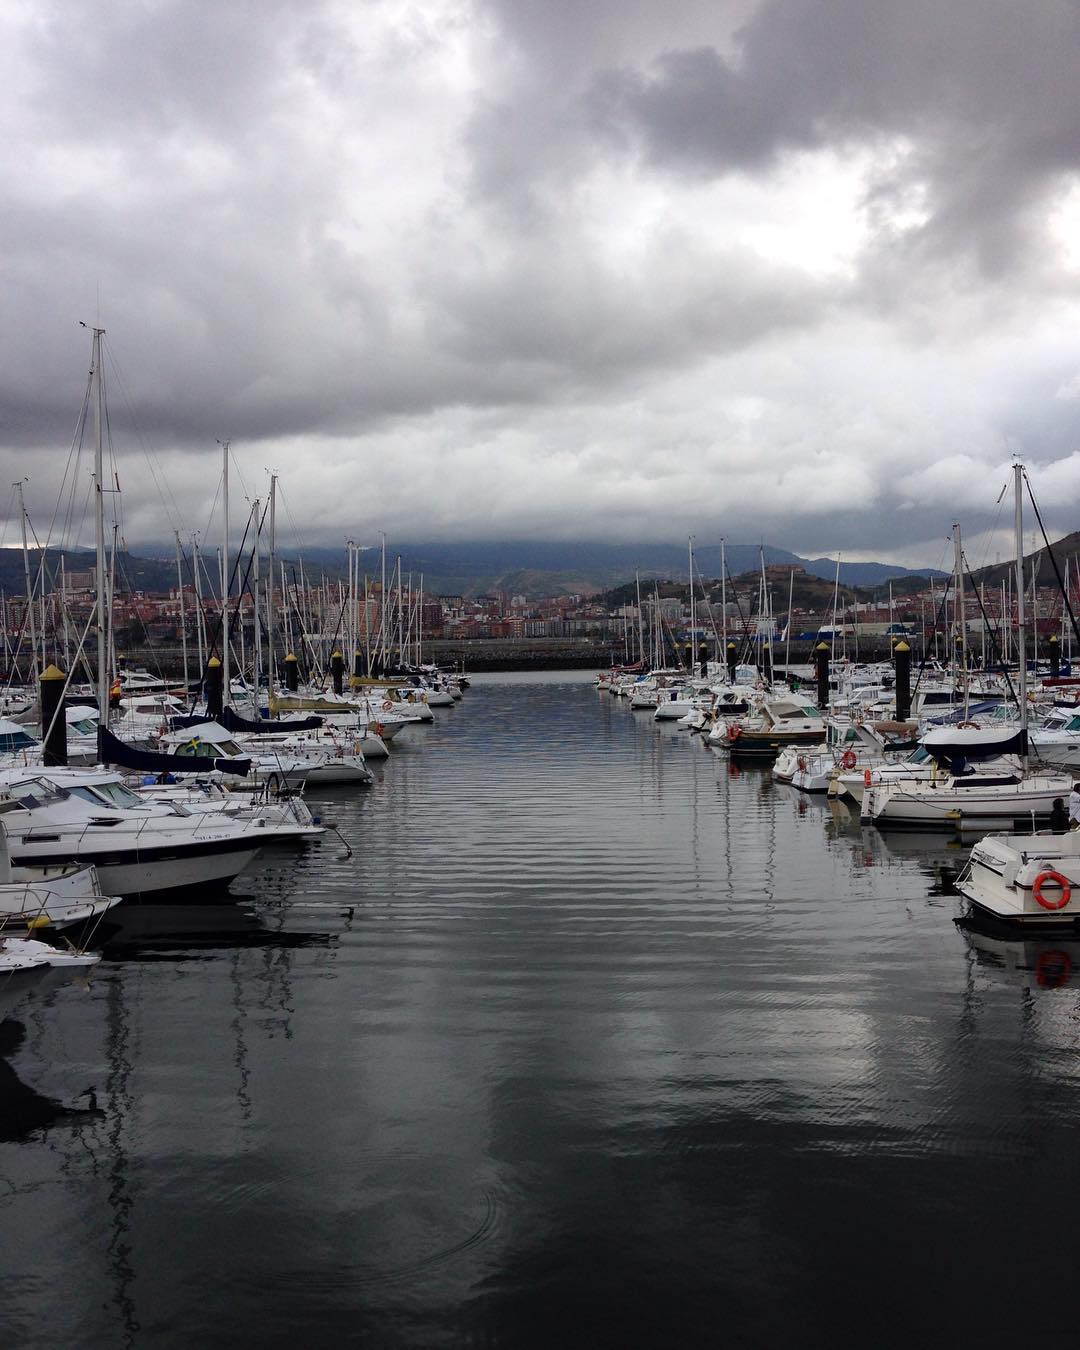 De puerto en puerto - De Puerto En Puerto